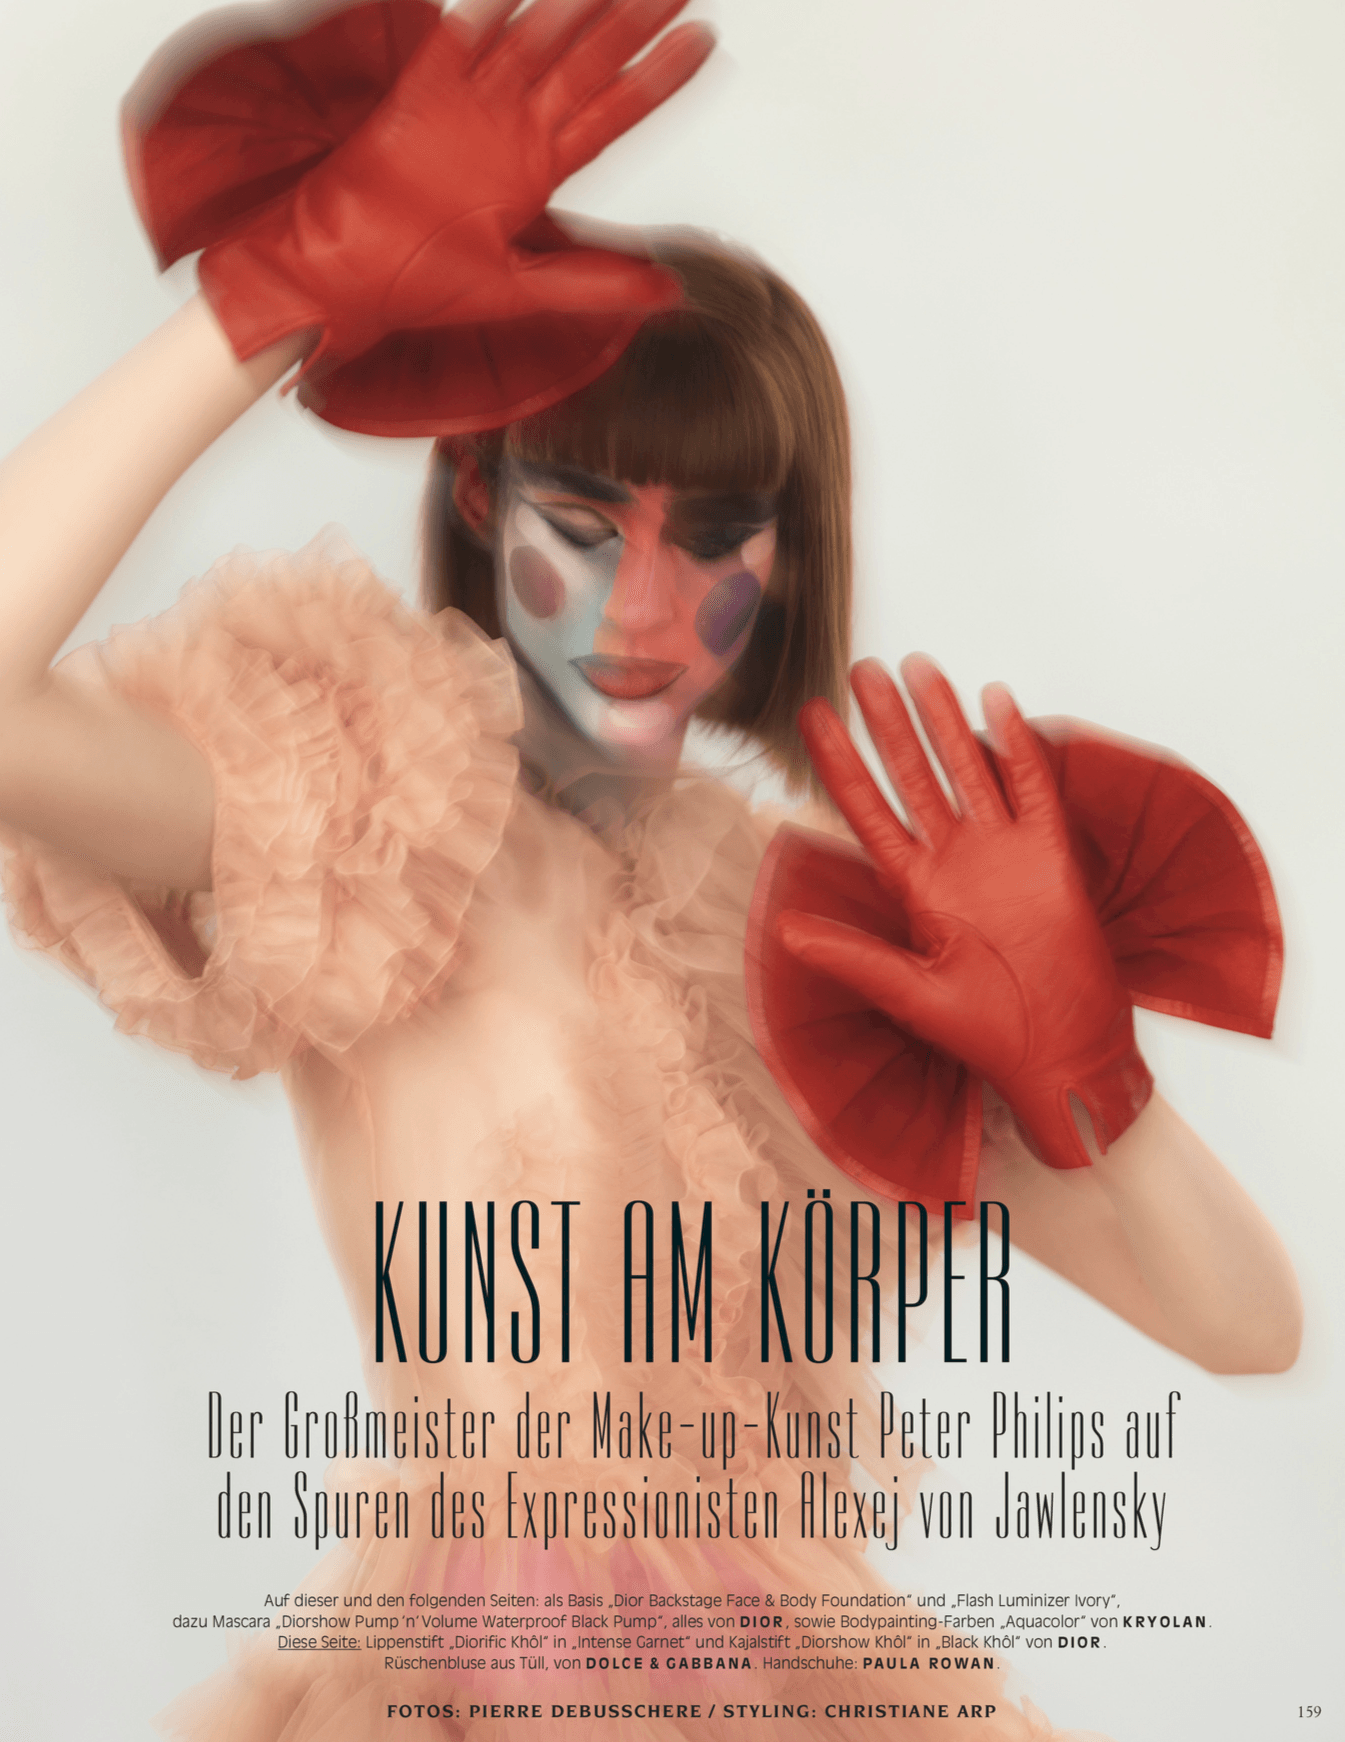 Publication: Vogue Germany<br />Stylist: Christiane Arp<br />Photographer: Pierre Debusschere<br />Gloves: Minnie Massive